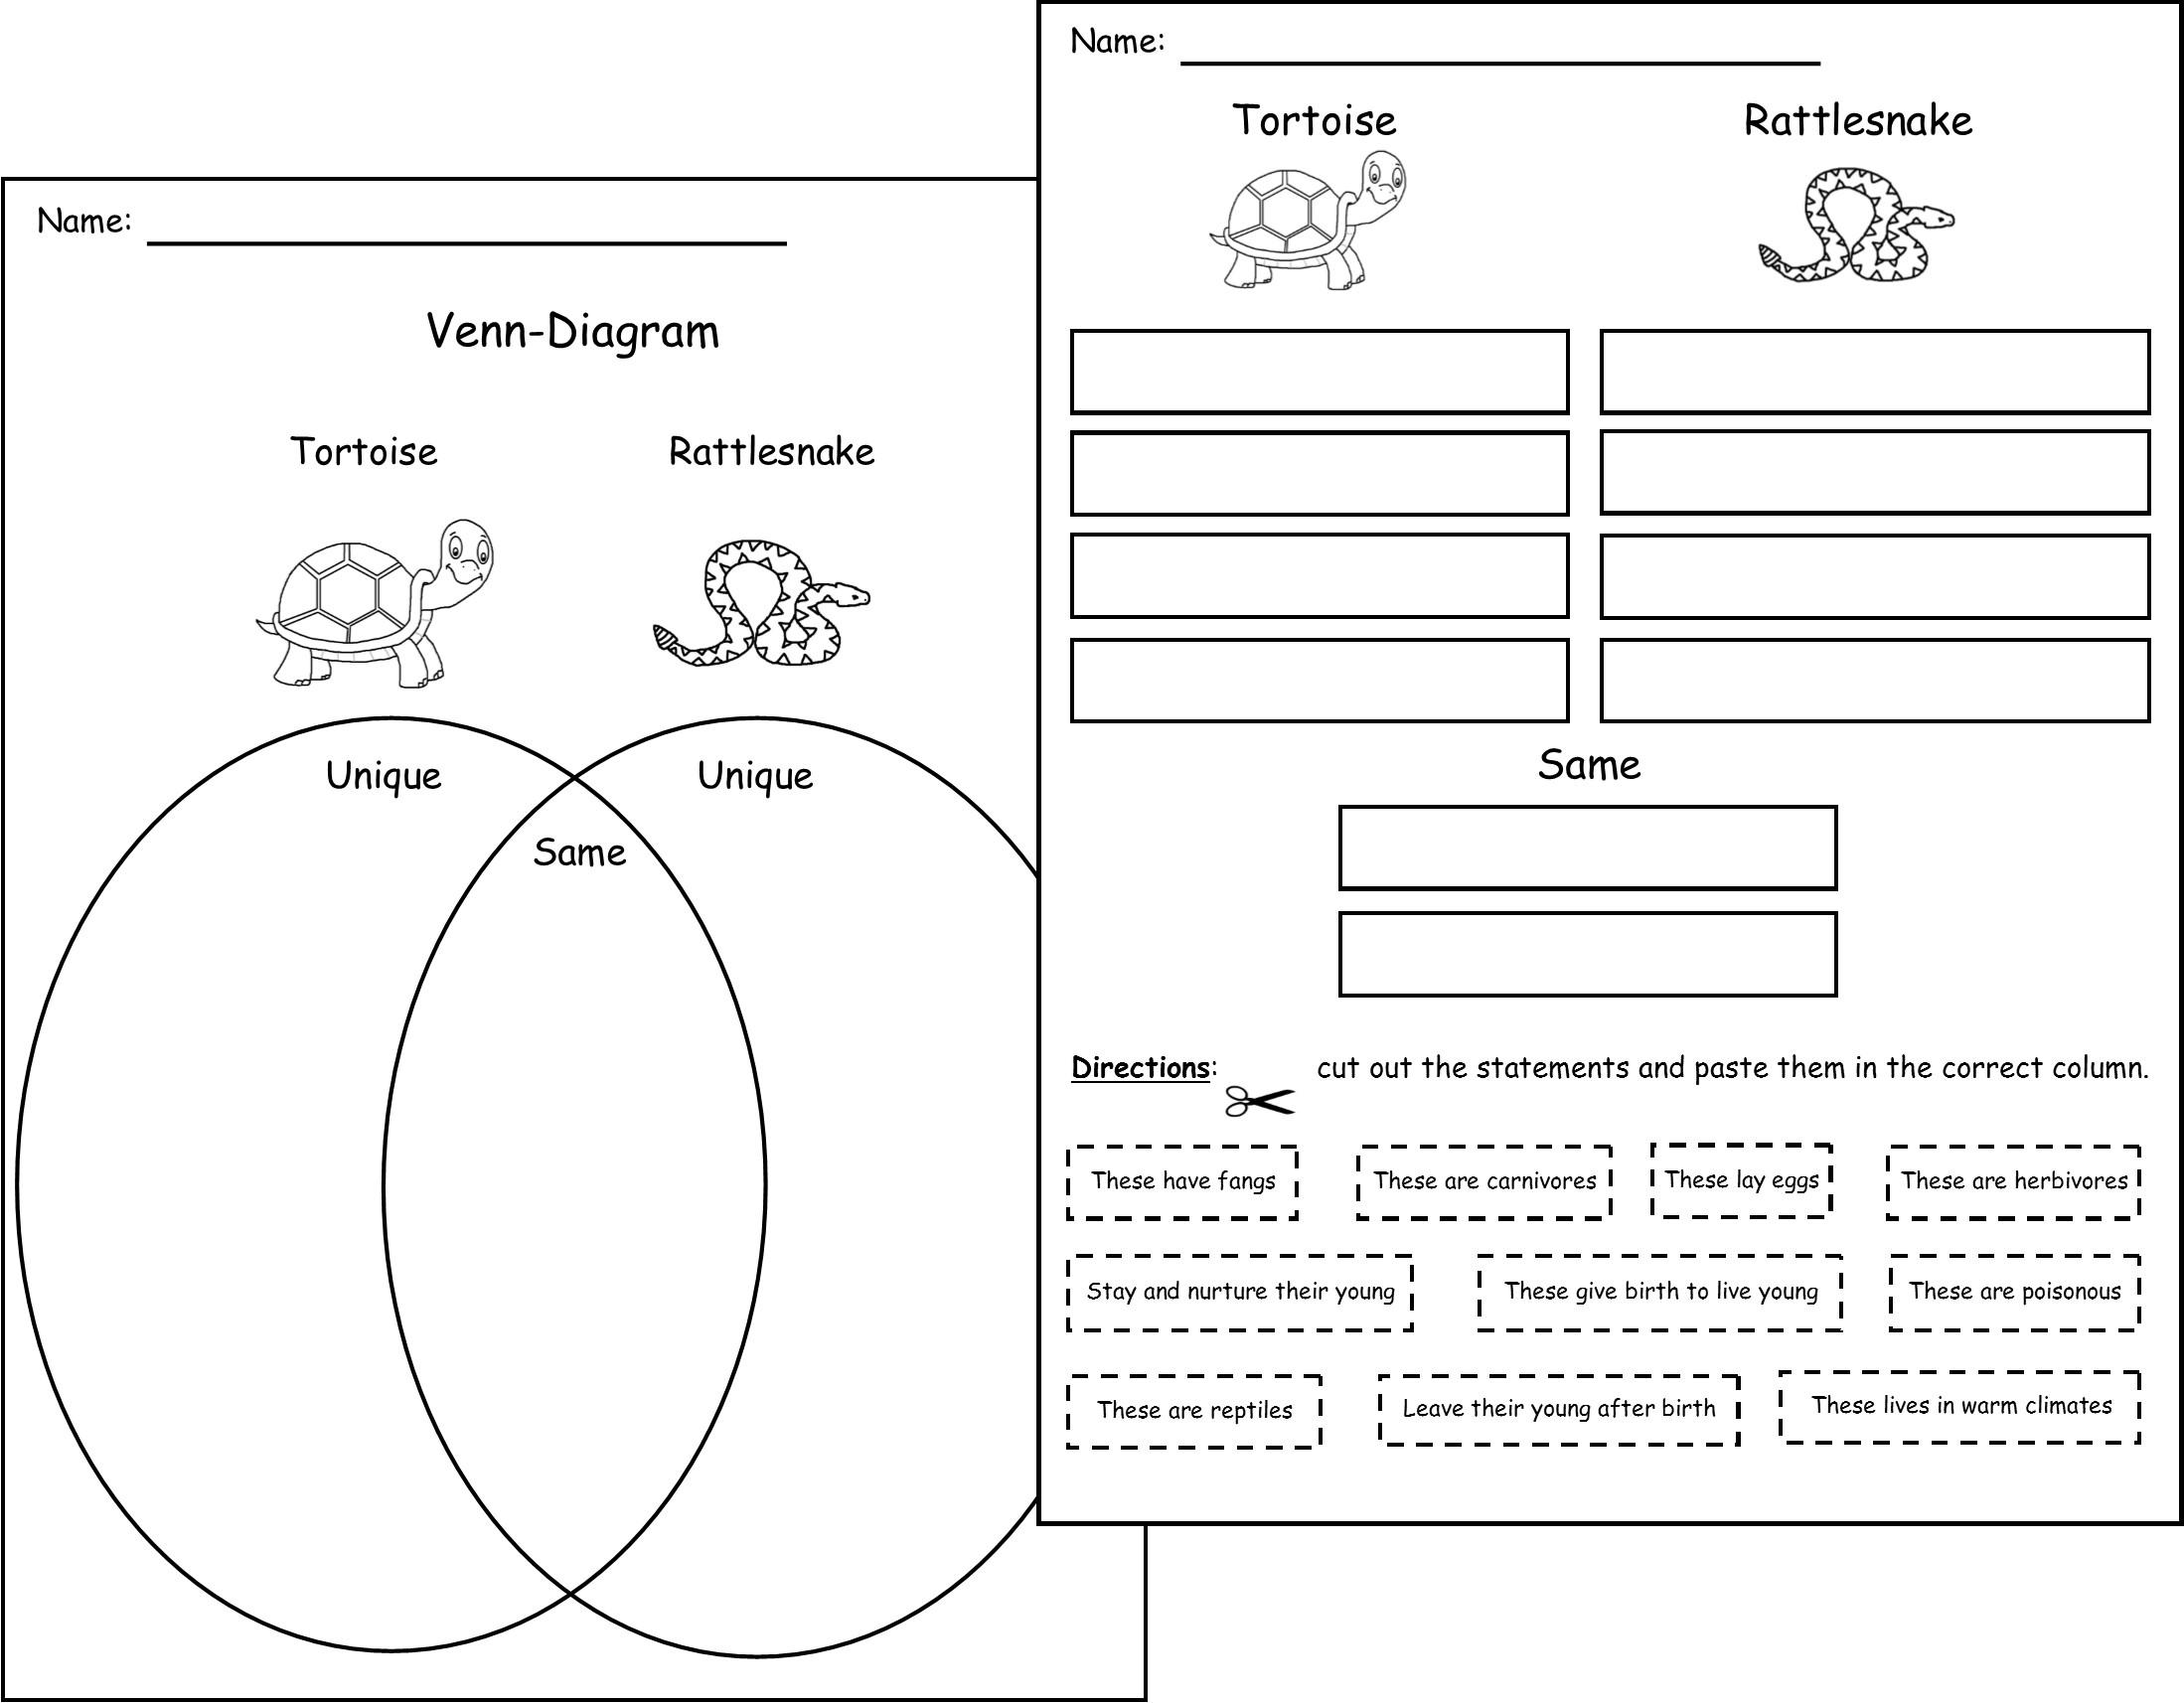 Wood Mizer Micro Switch Wiring Diagram Schematics Diagrams Awesome Tortoise Machine Photos